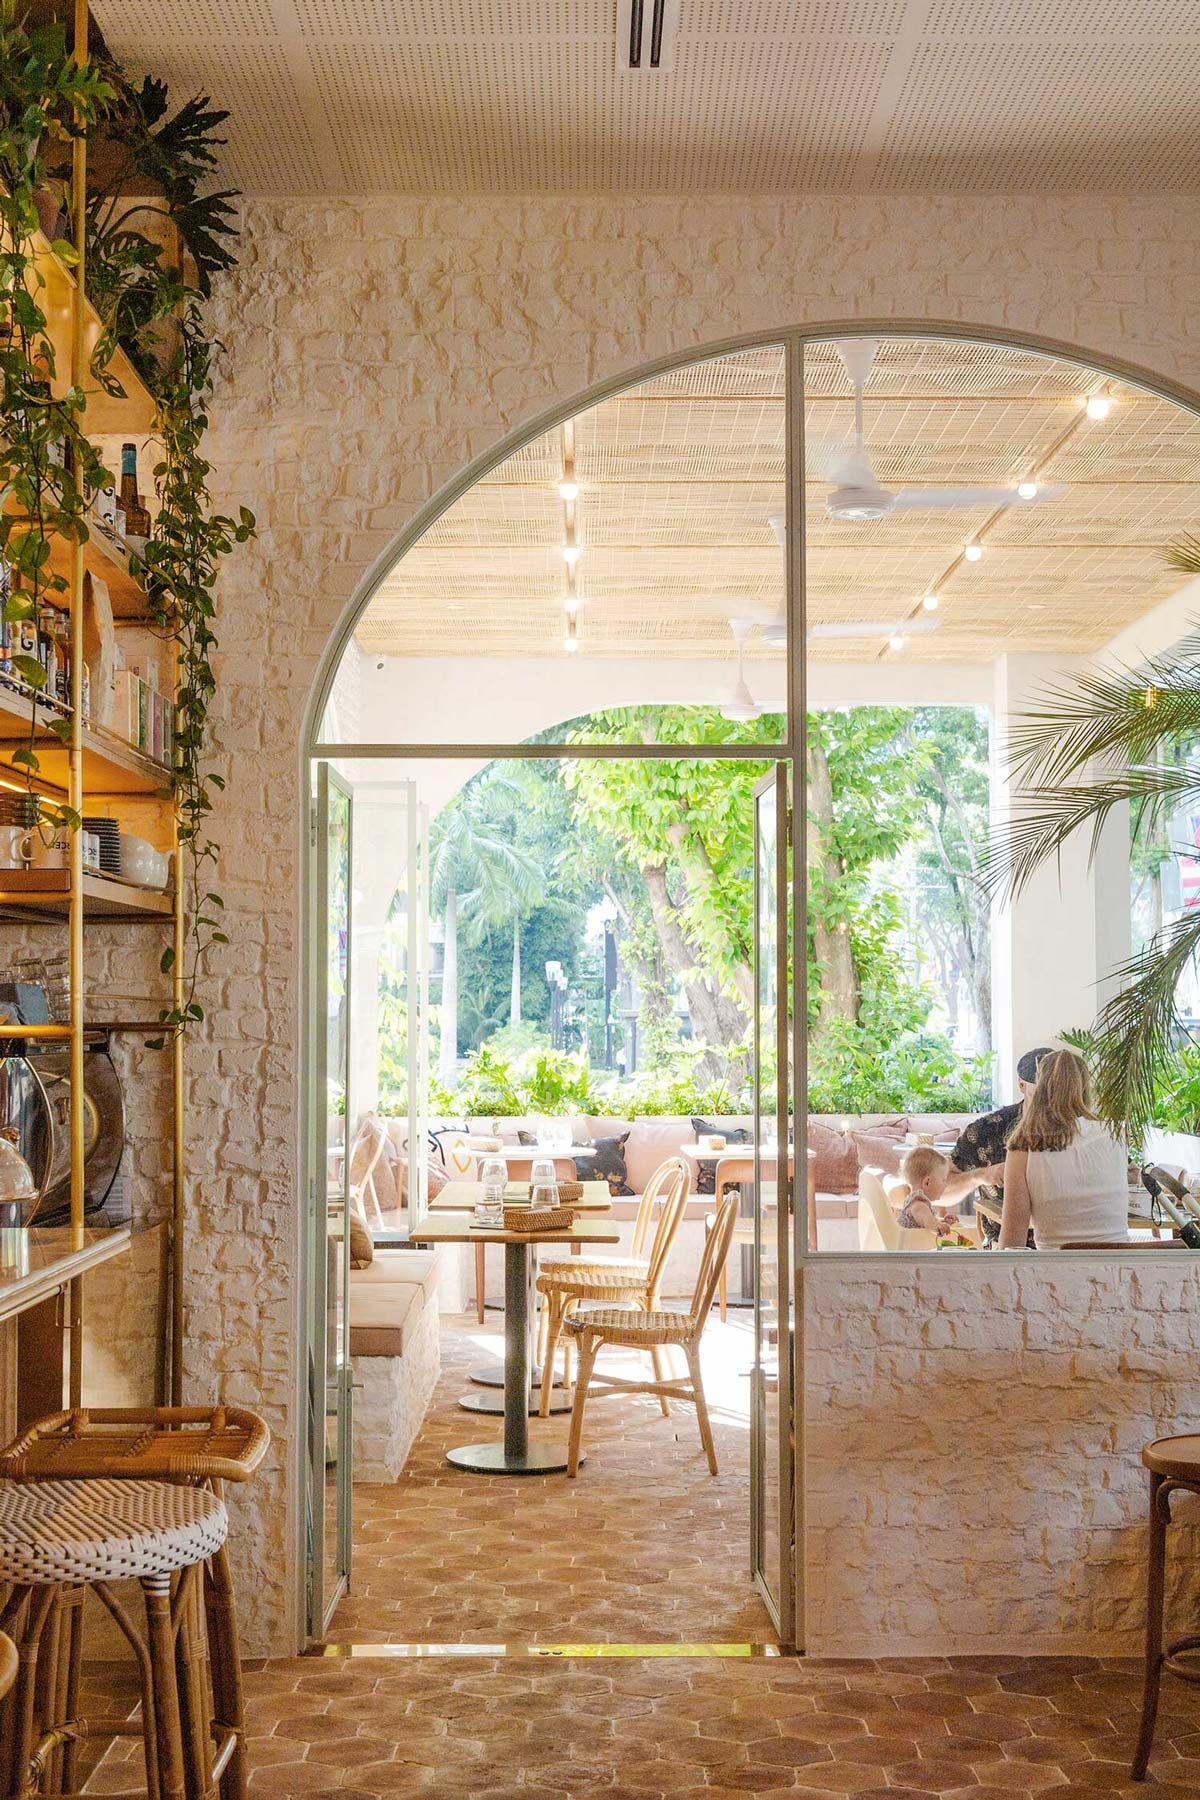 Merci Marcel A Parisian Cafe In Singapore In 2020 Orchard Road Singapore Parisian Cafe Interior